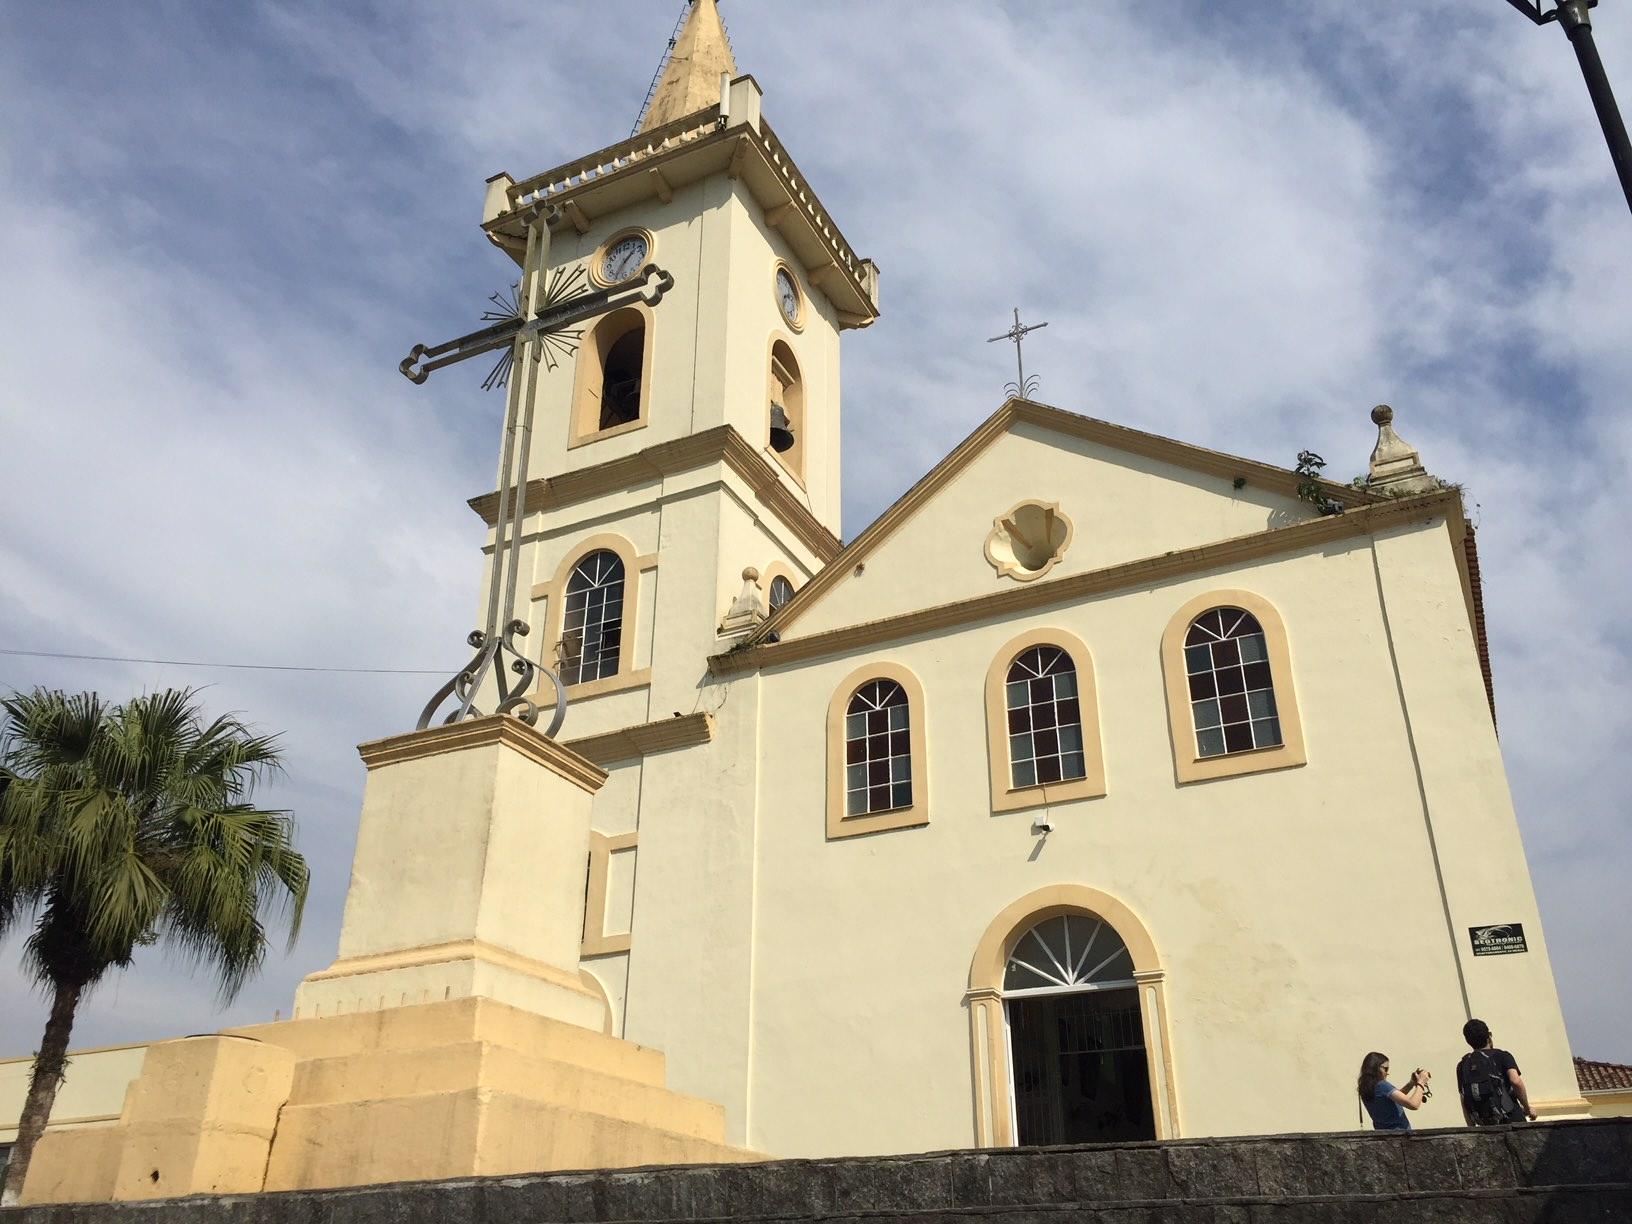 La iglesia de Morretes, situada en un alto desde el cual se contempla la vista panorámica de Morretes